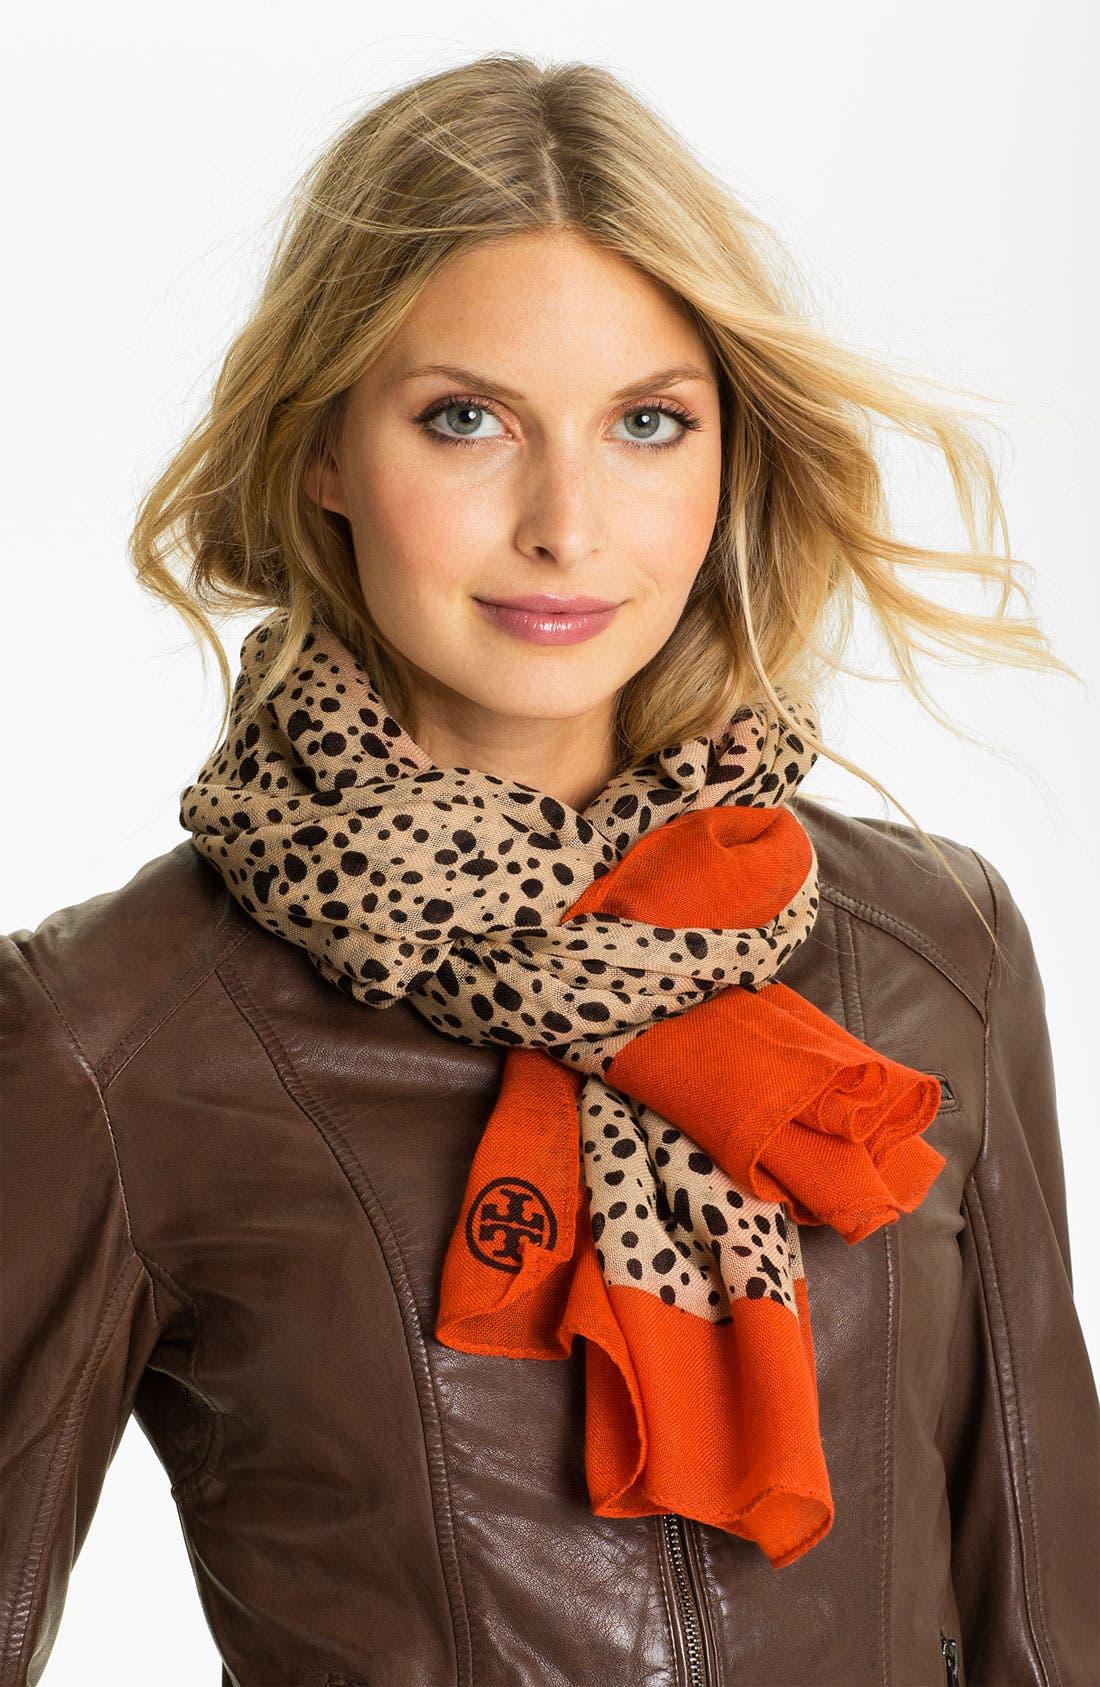 Main Image - Tory Burch 'Cheetah' Wool Scarf